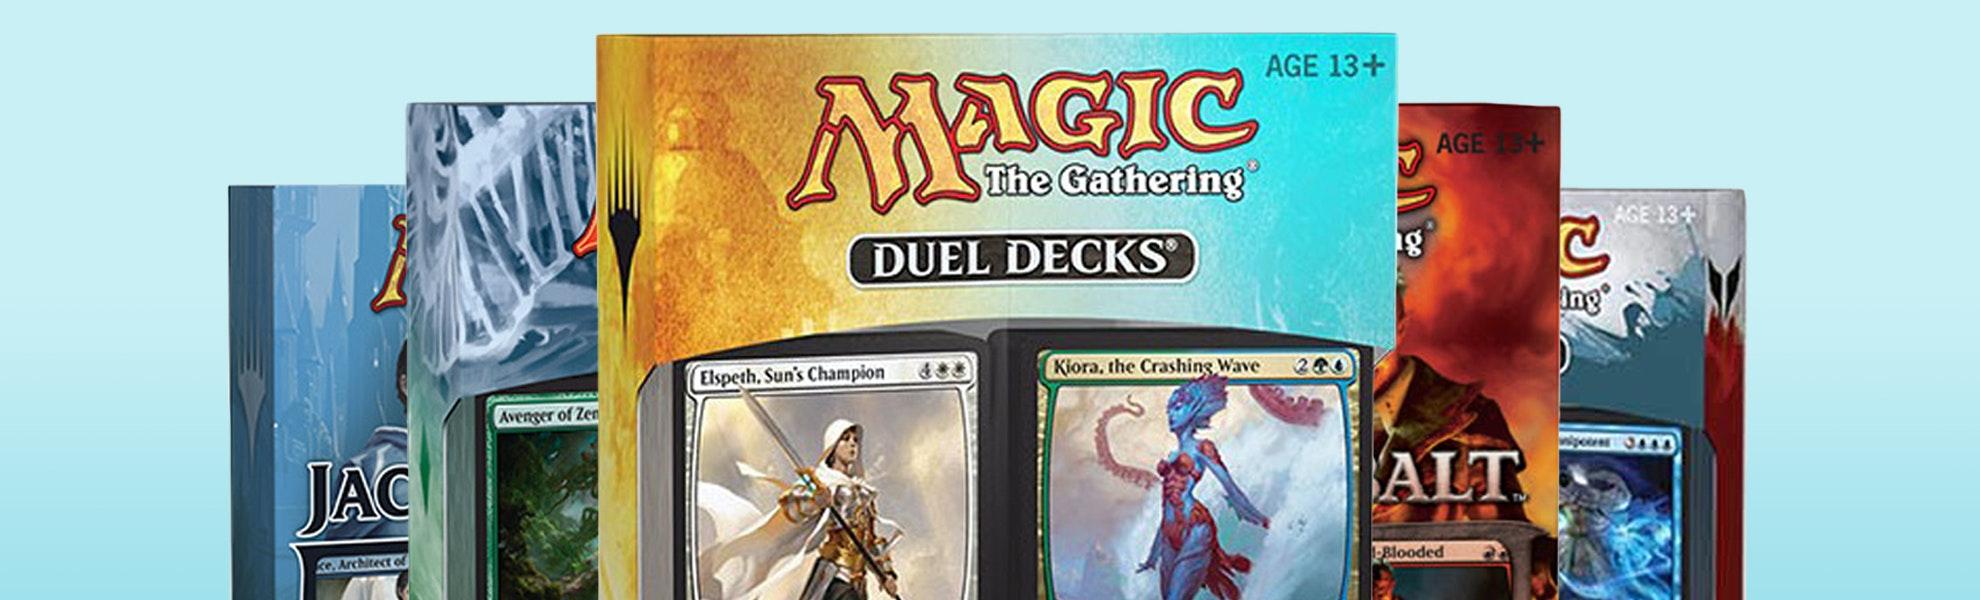 Magic: the Gathering Duel Decks (5-Pack)